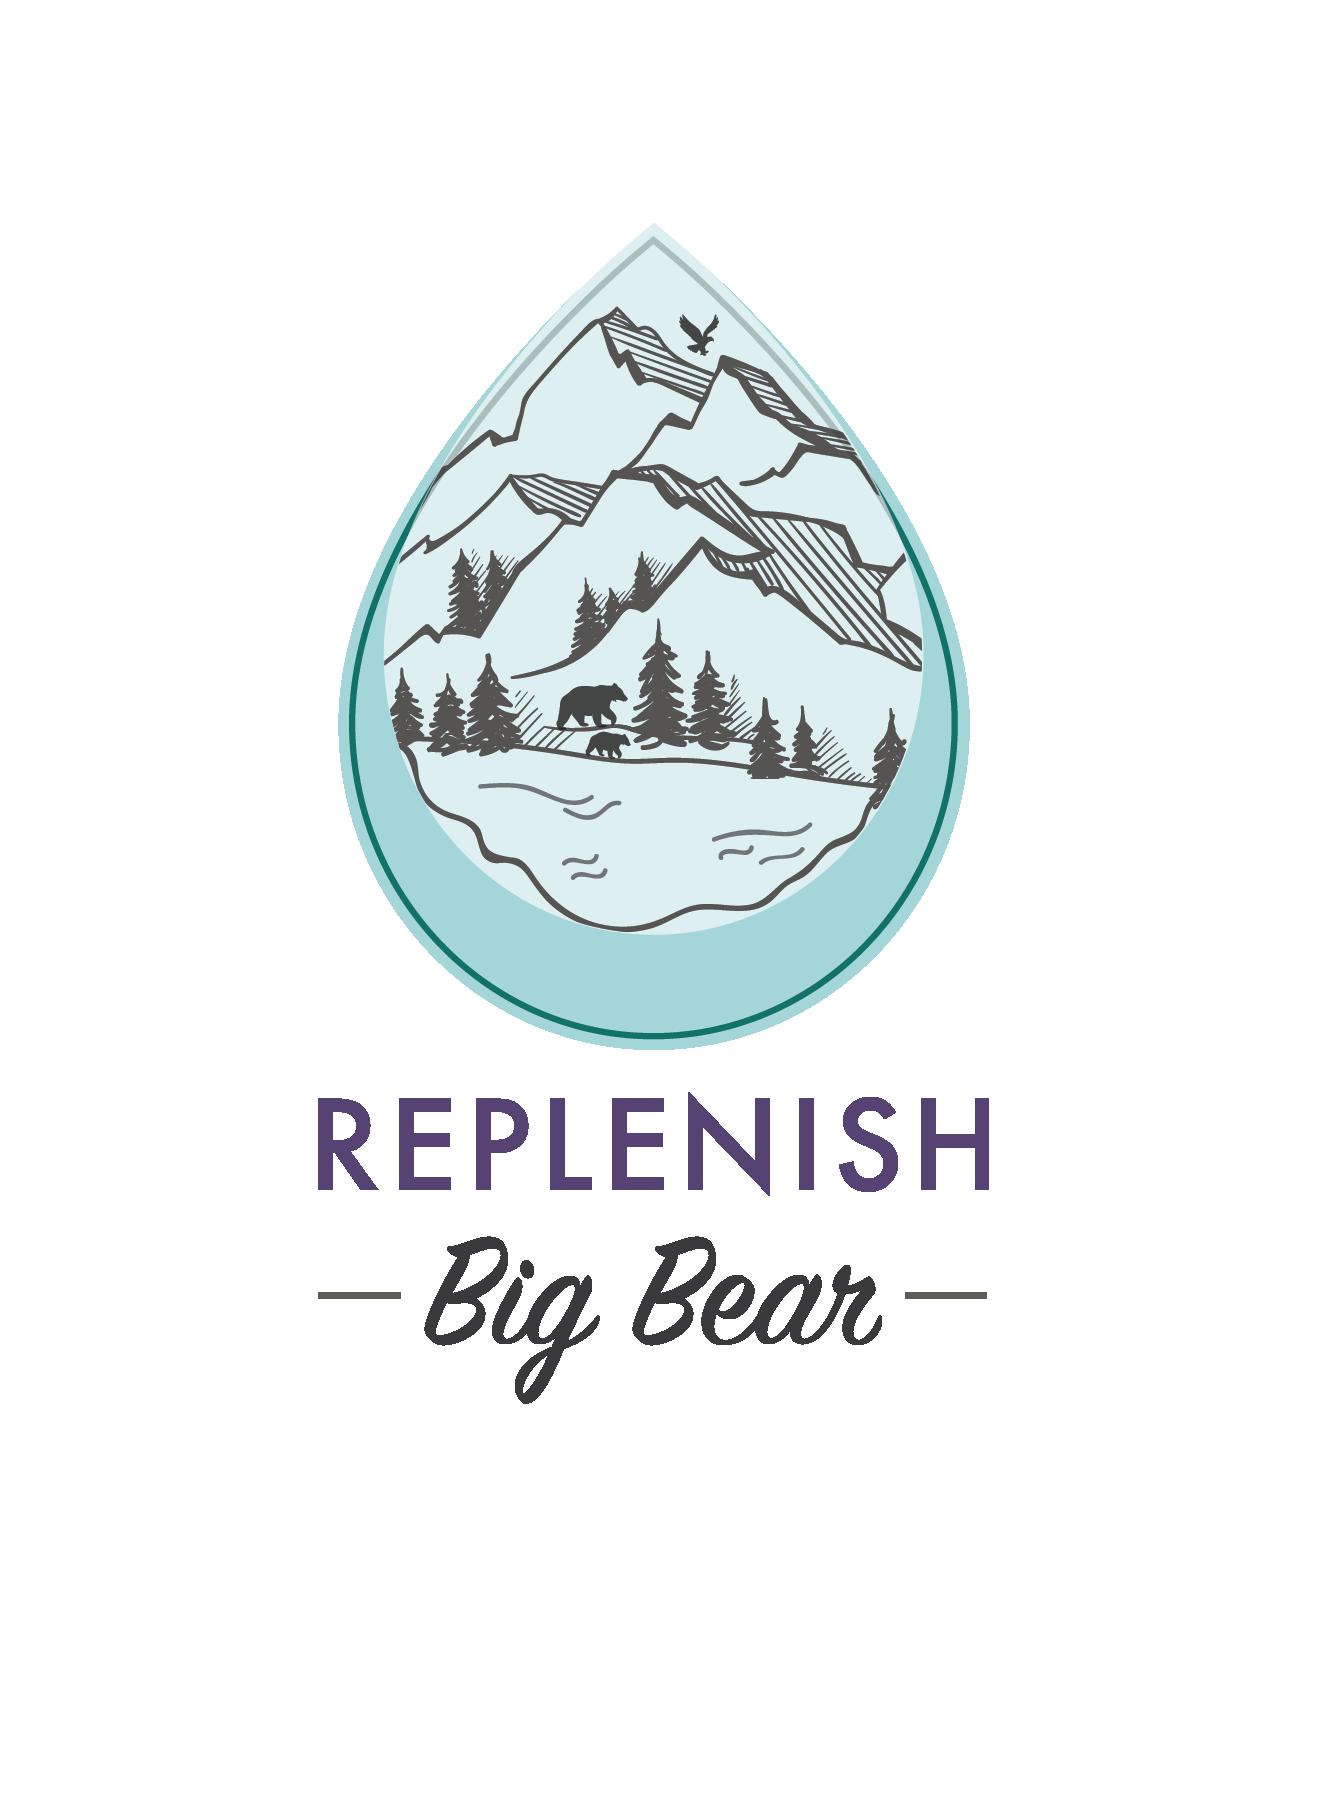 Replenish Big Bear Raindrop with Mountains